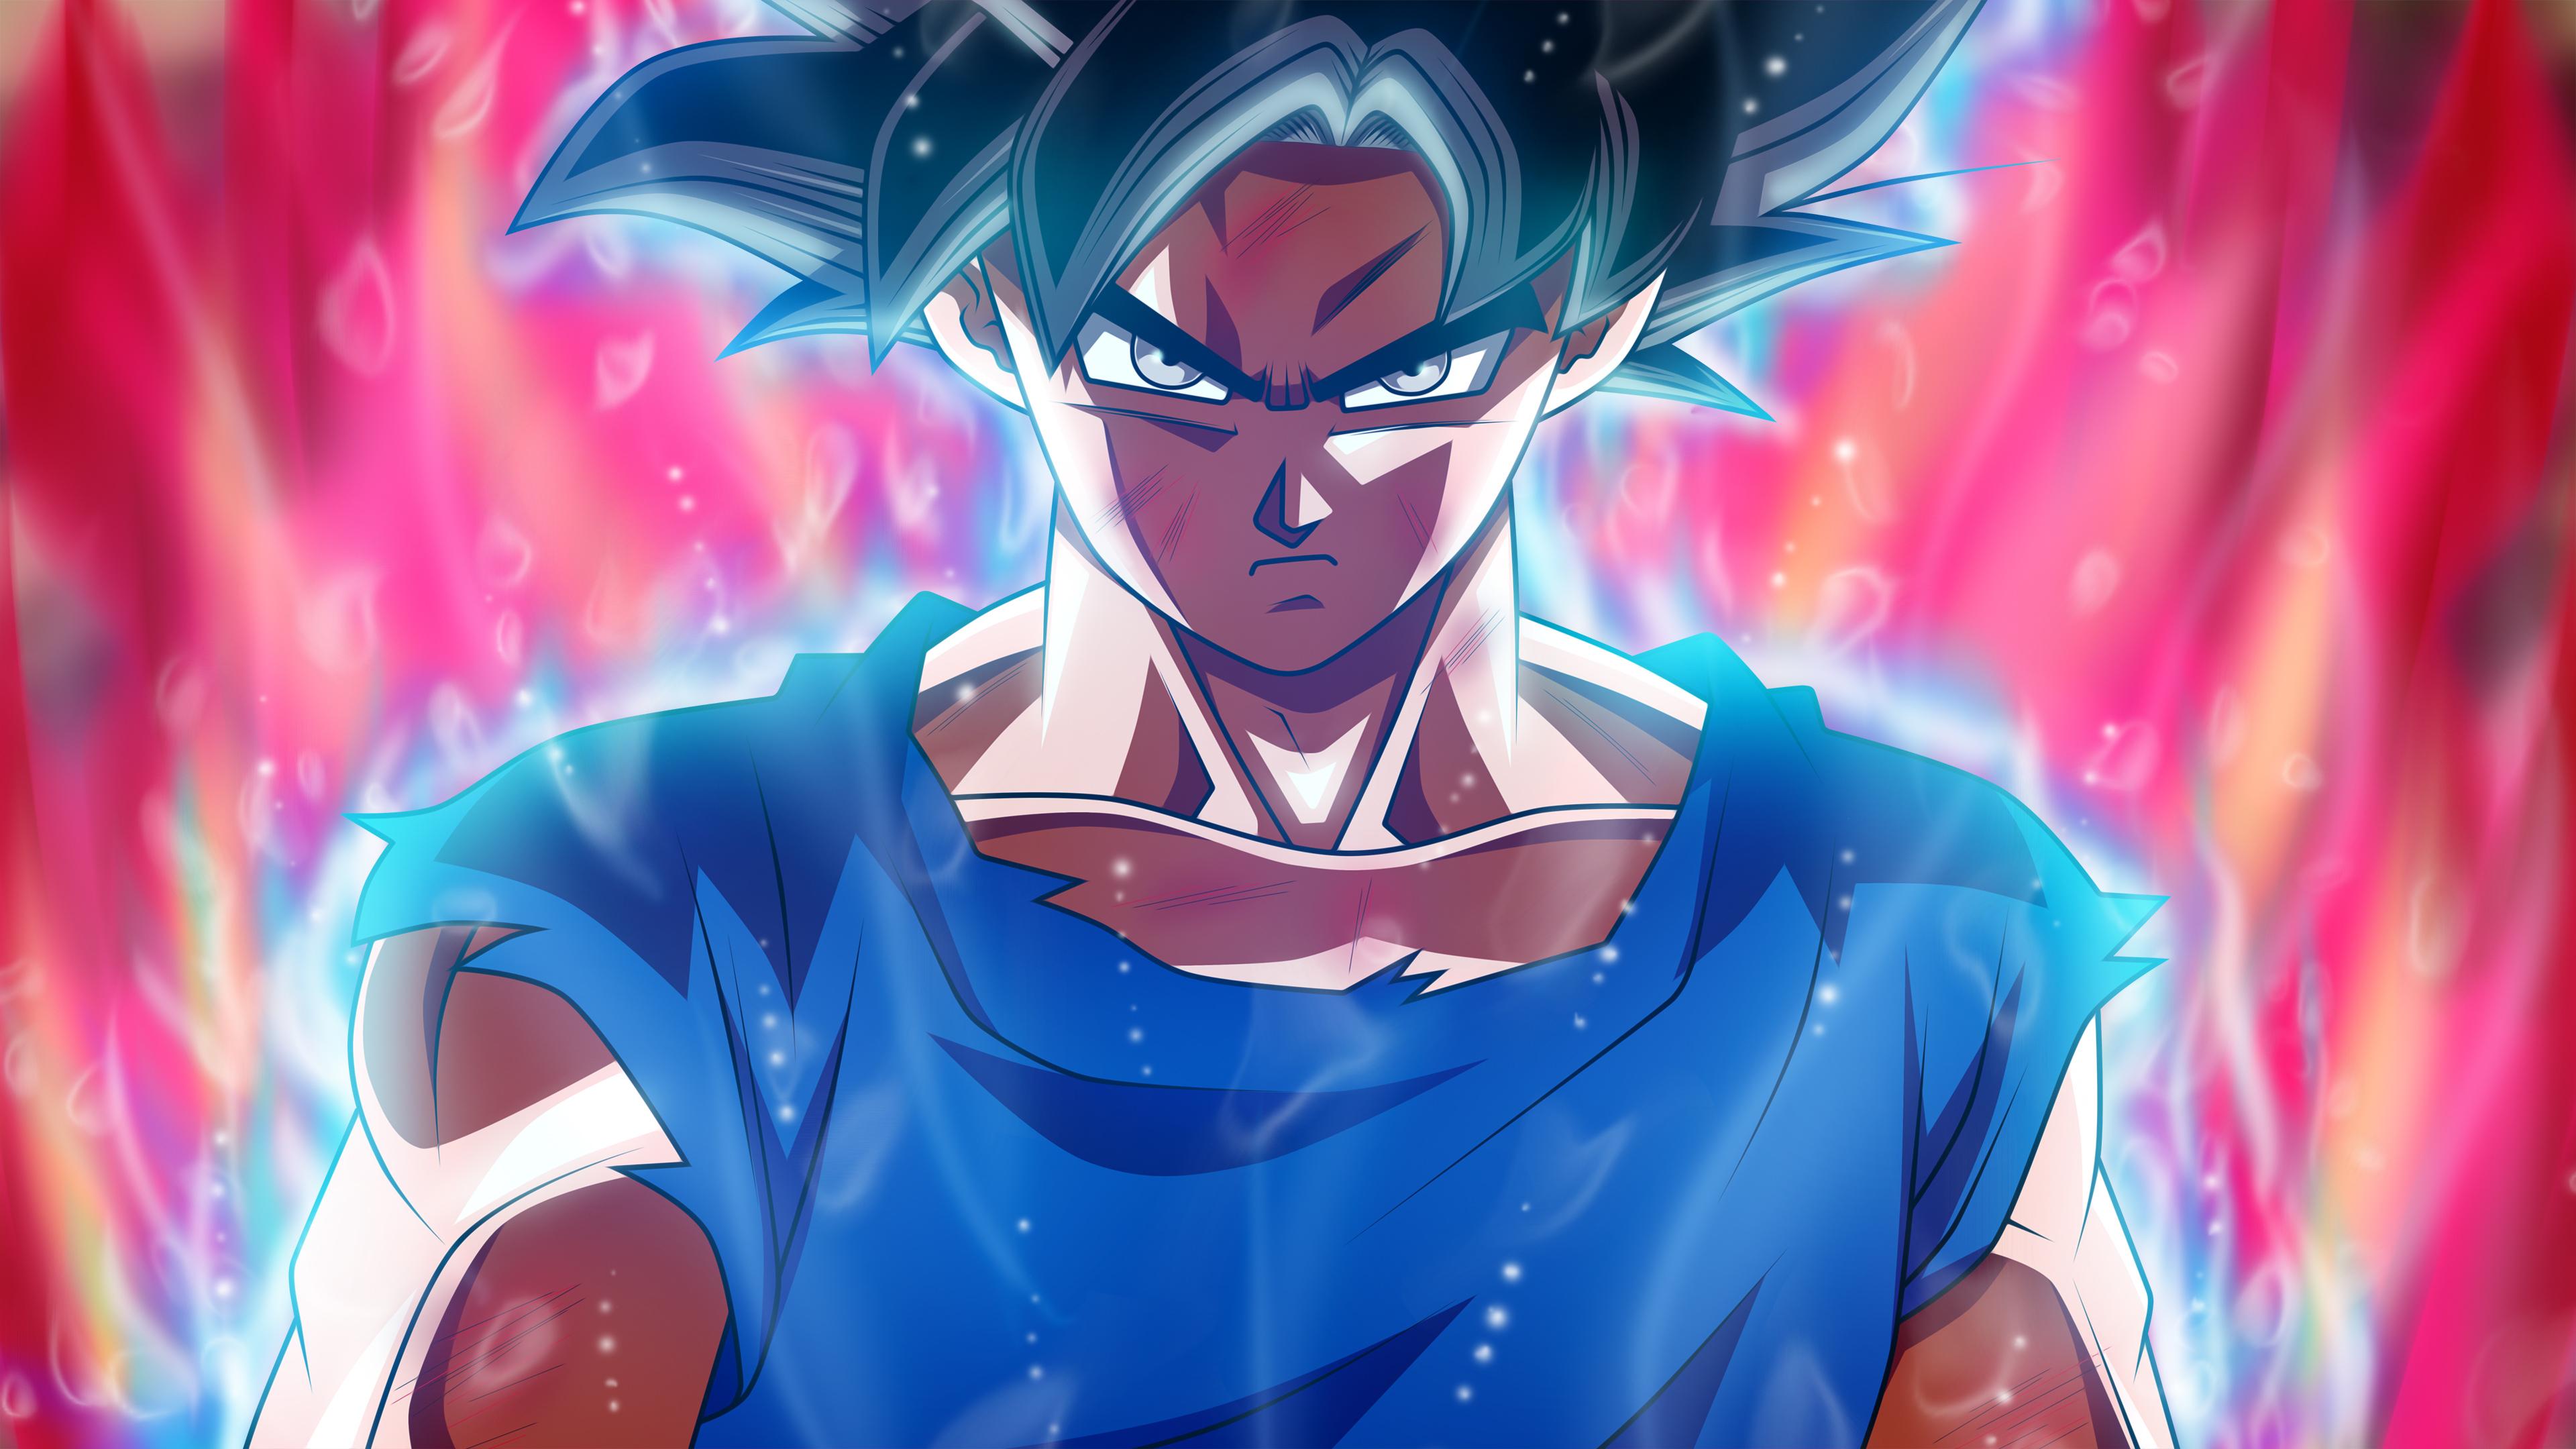 Wallpaper 4k Ultra Instinct Goku 4k 4k Wallpapers Anime